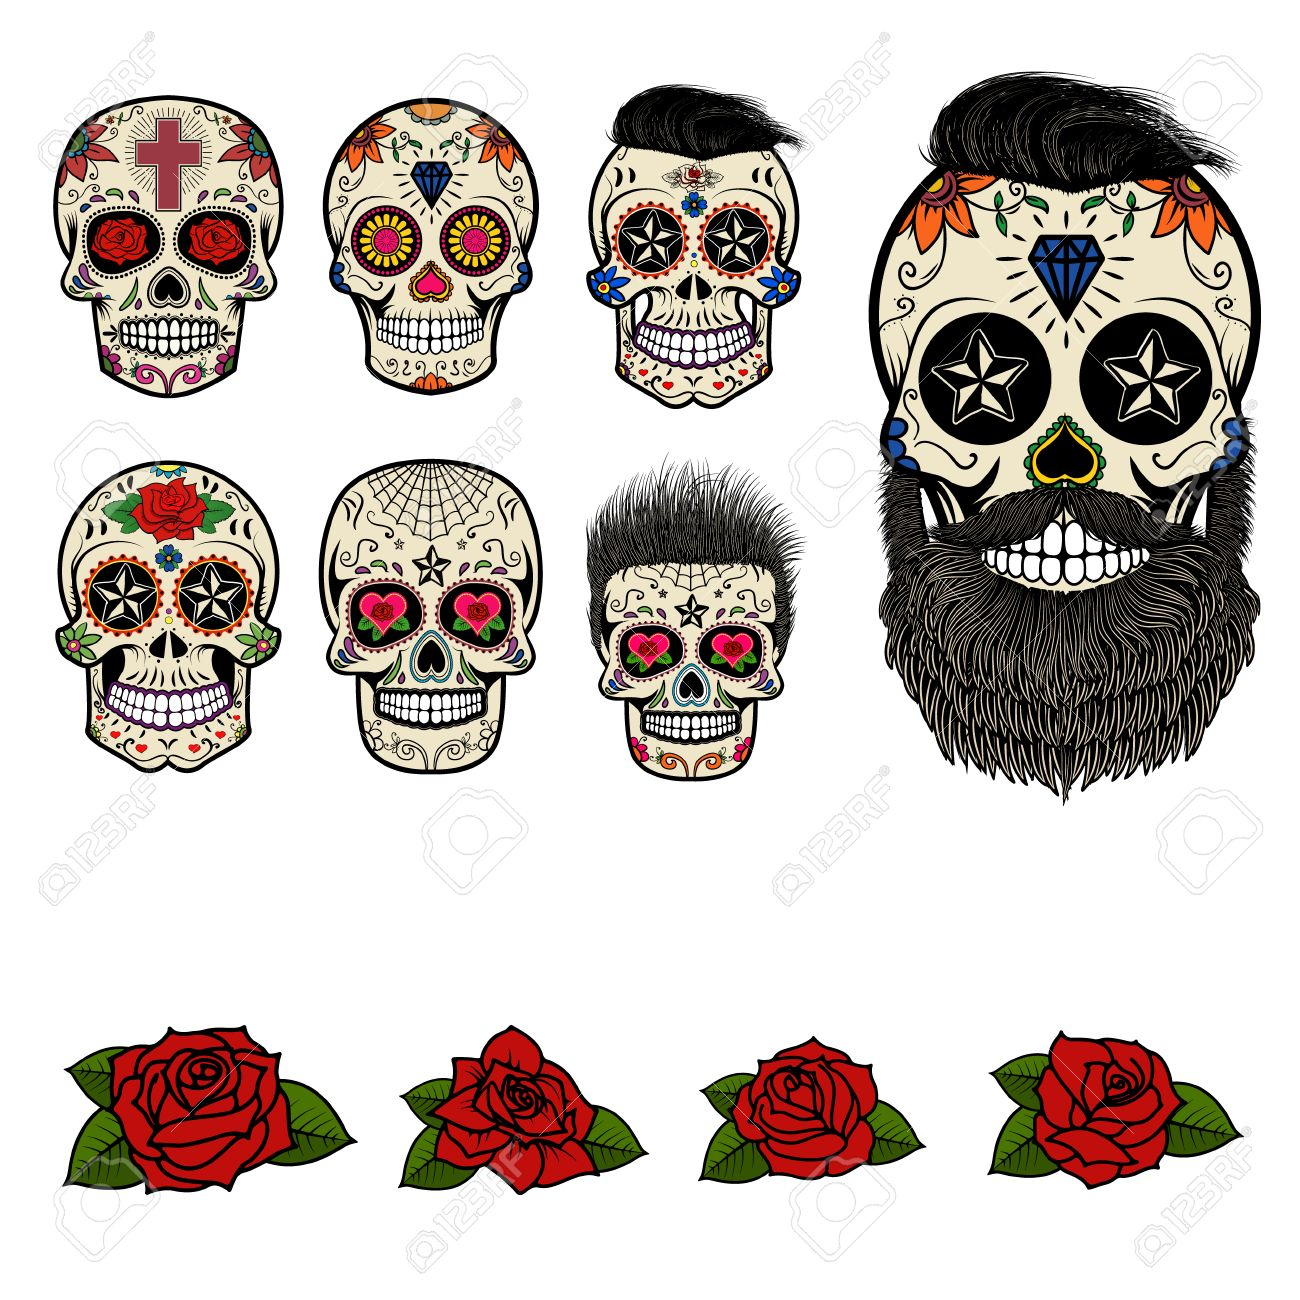 Set Of Sugar Skulls And Design Elements Day Of The Dead Skull